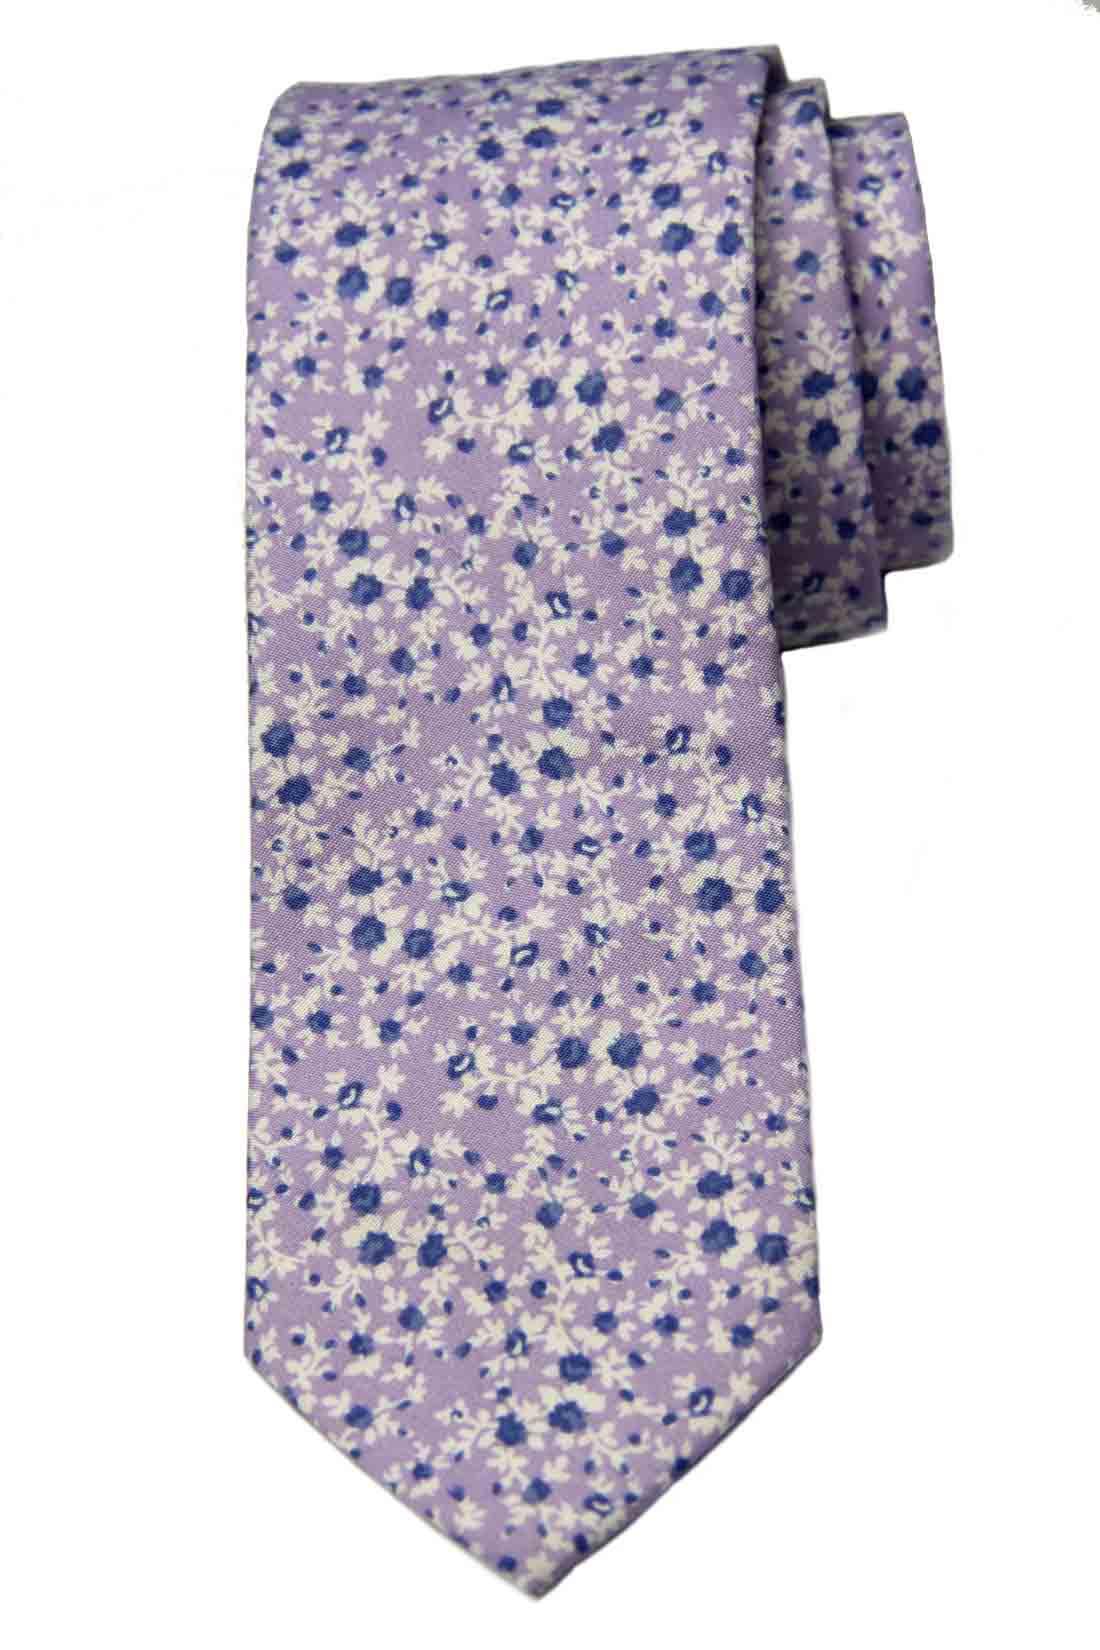 Bar III Cotton Tie Floral Purple White Blue Narrow Men's